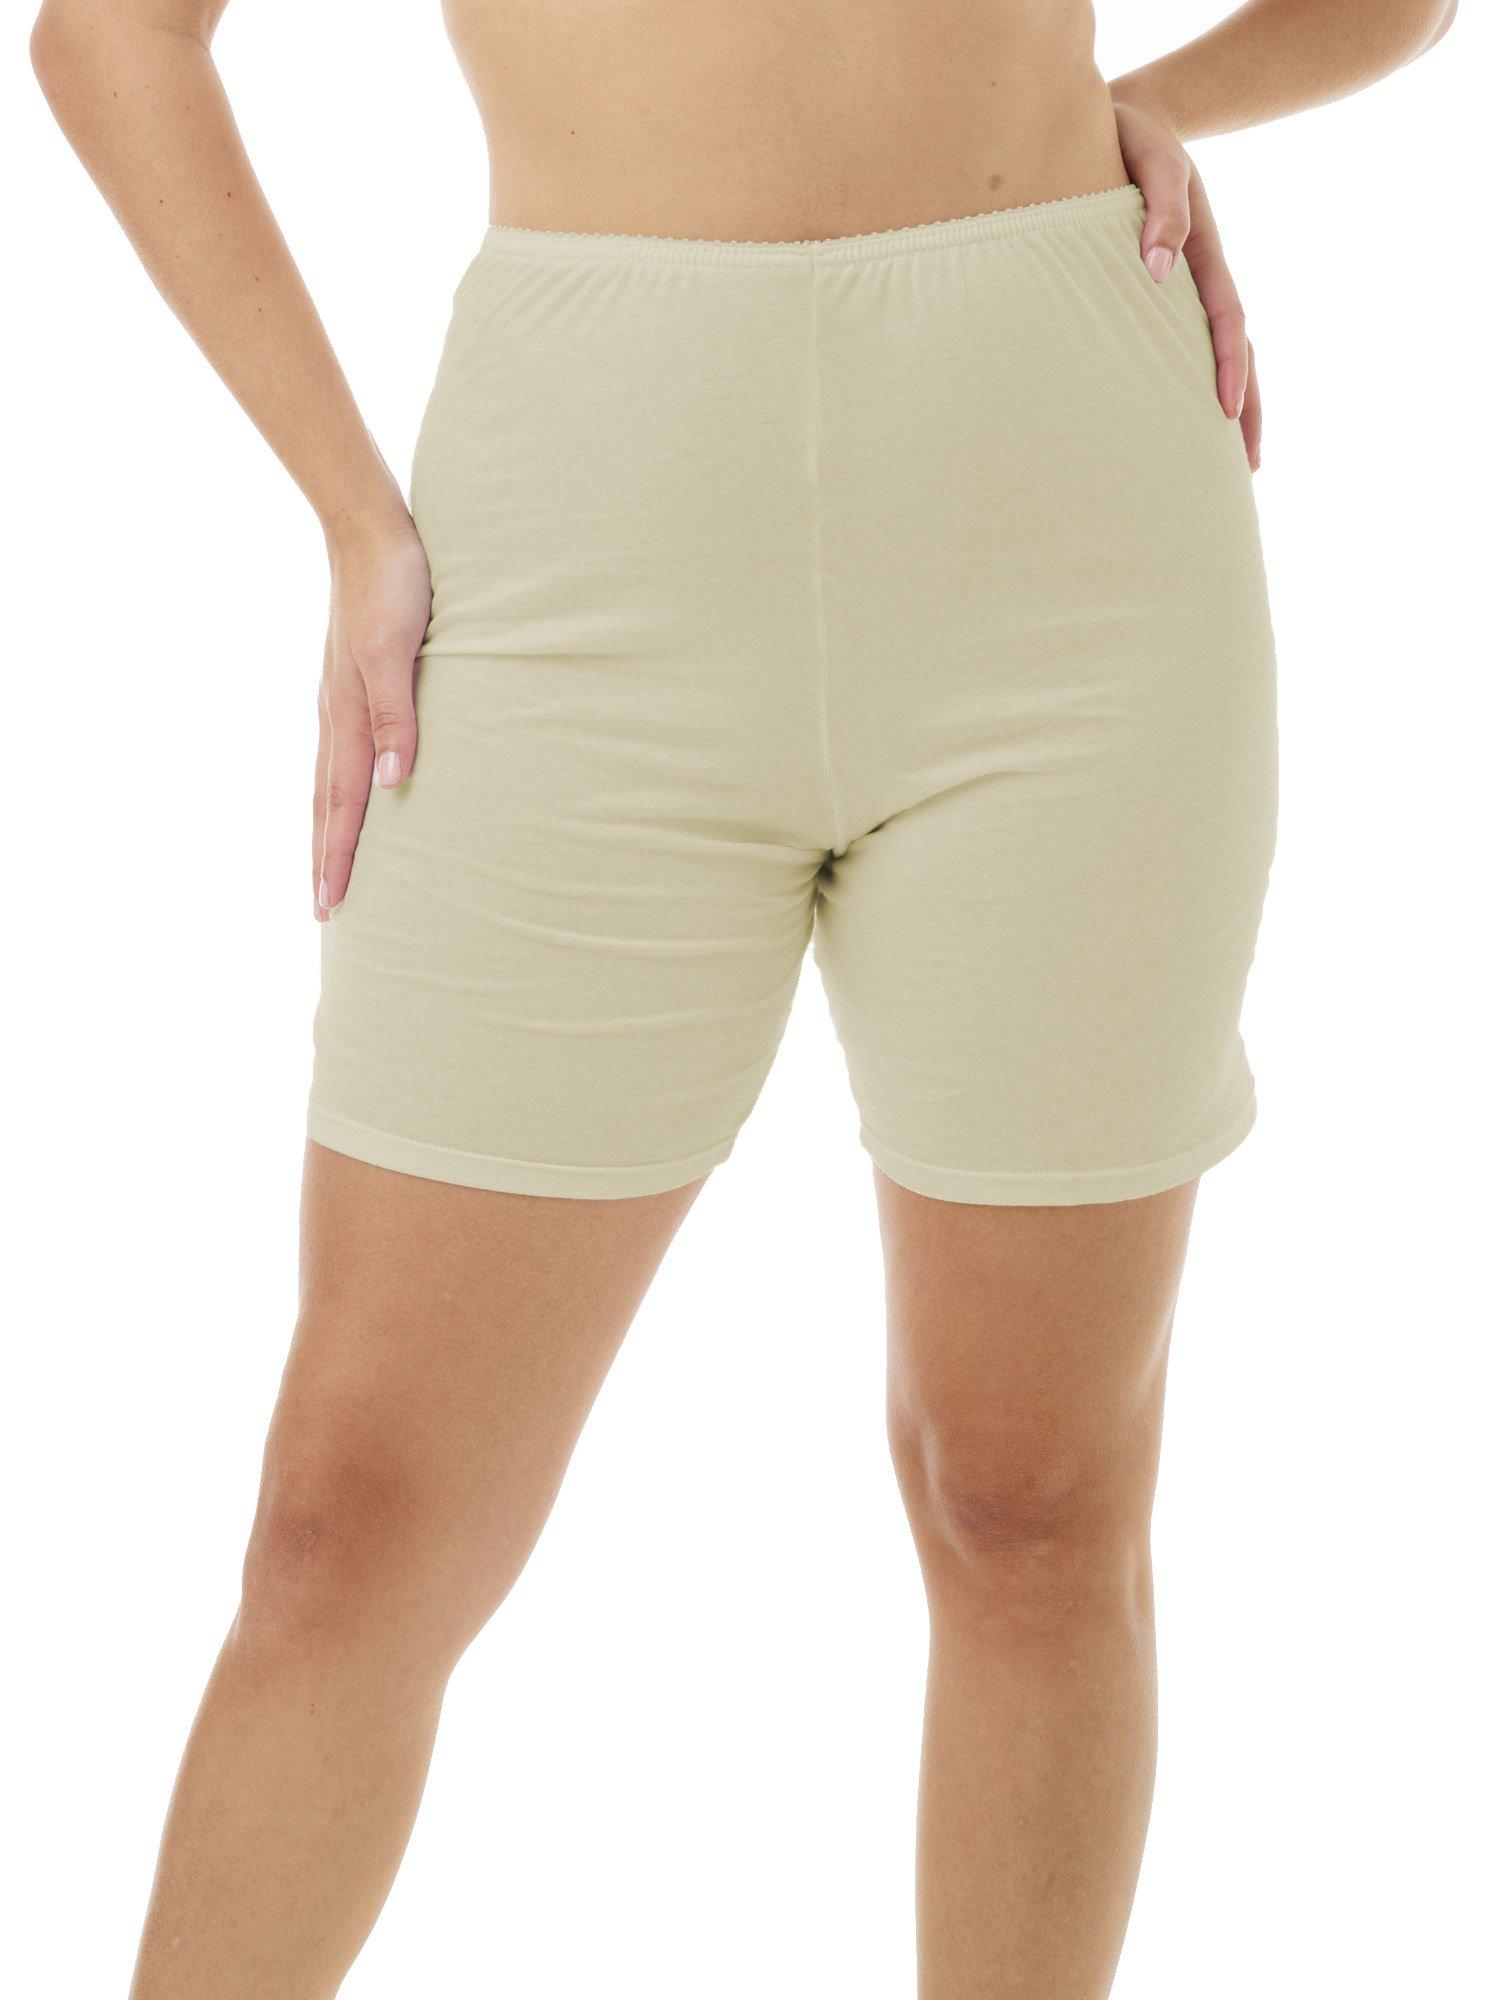 Underworks Womens 100% Cotton Cuff Leg Boy-Leg Brief Bloomers Pettipants 8-inch Inseam 3-Pack